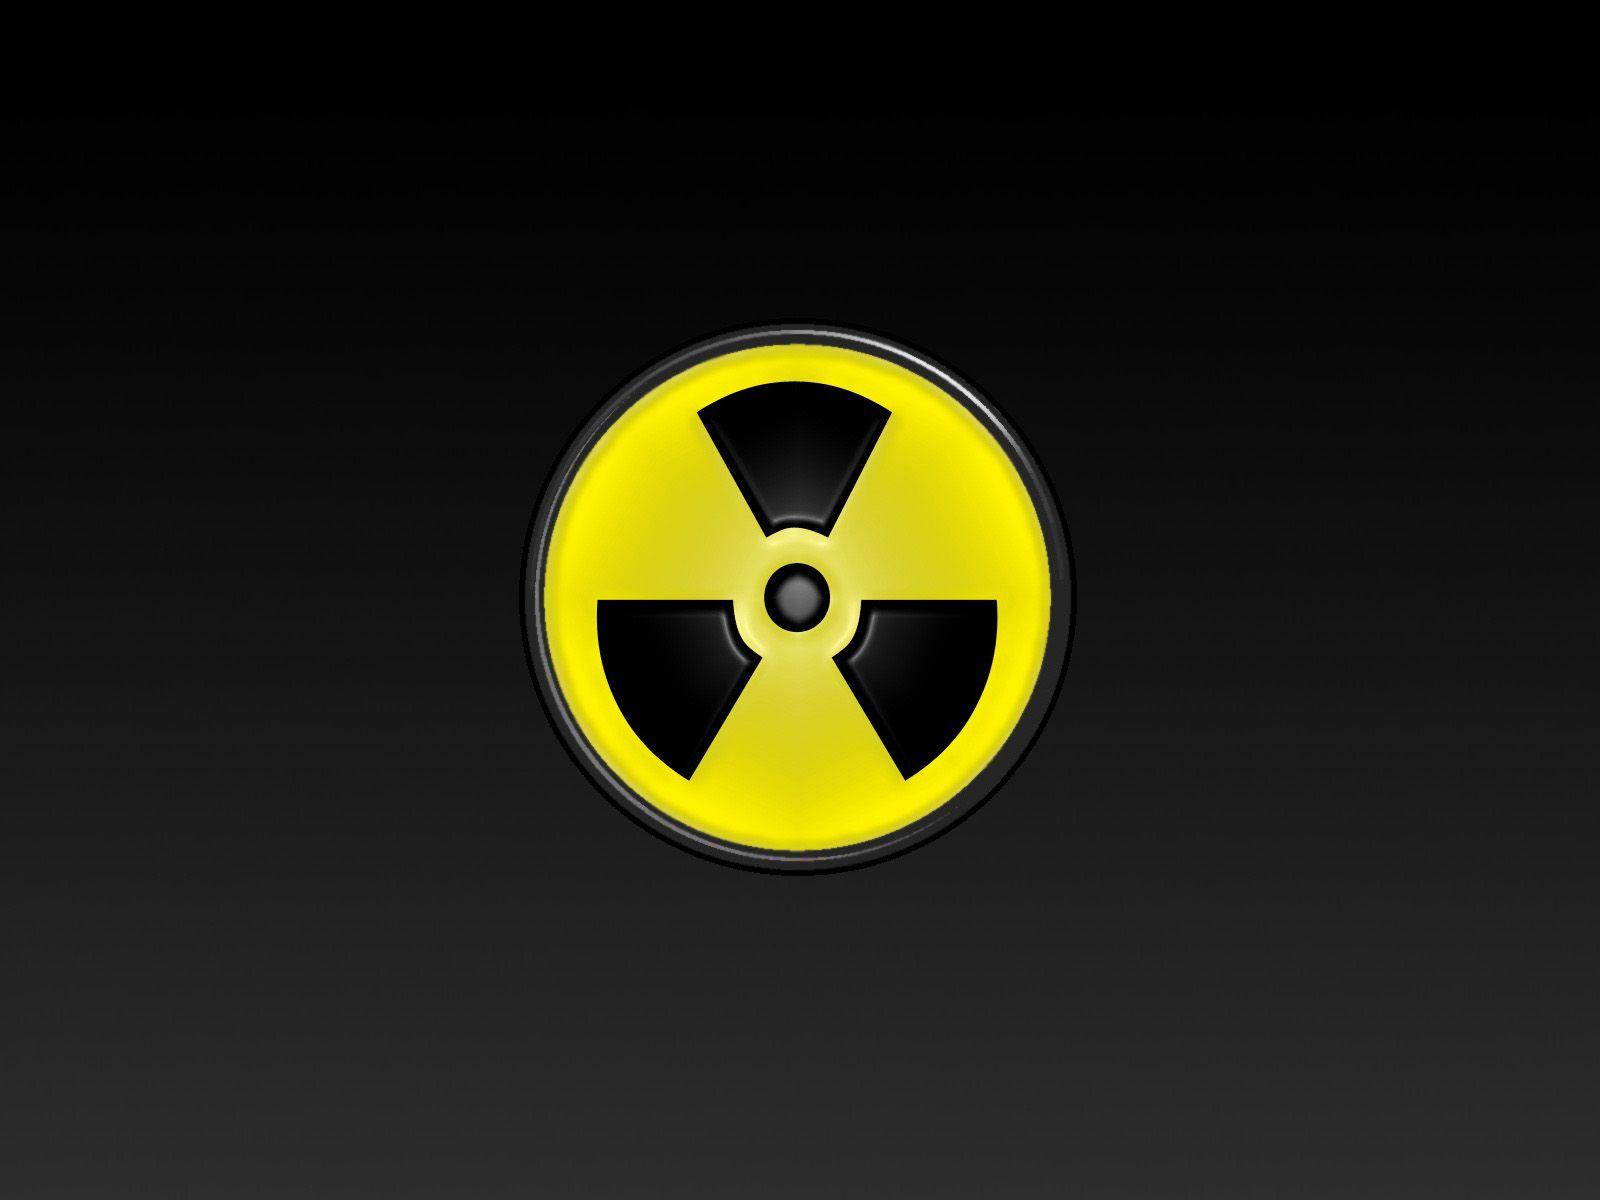 Nuclear Wallpaper Wallpapers - http://wallfic.com/nuclear-wallpaper-